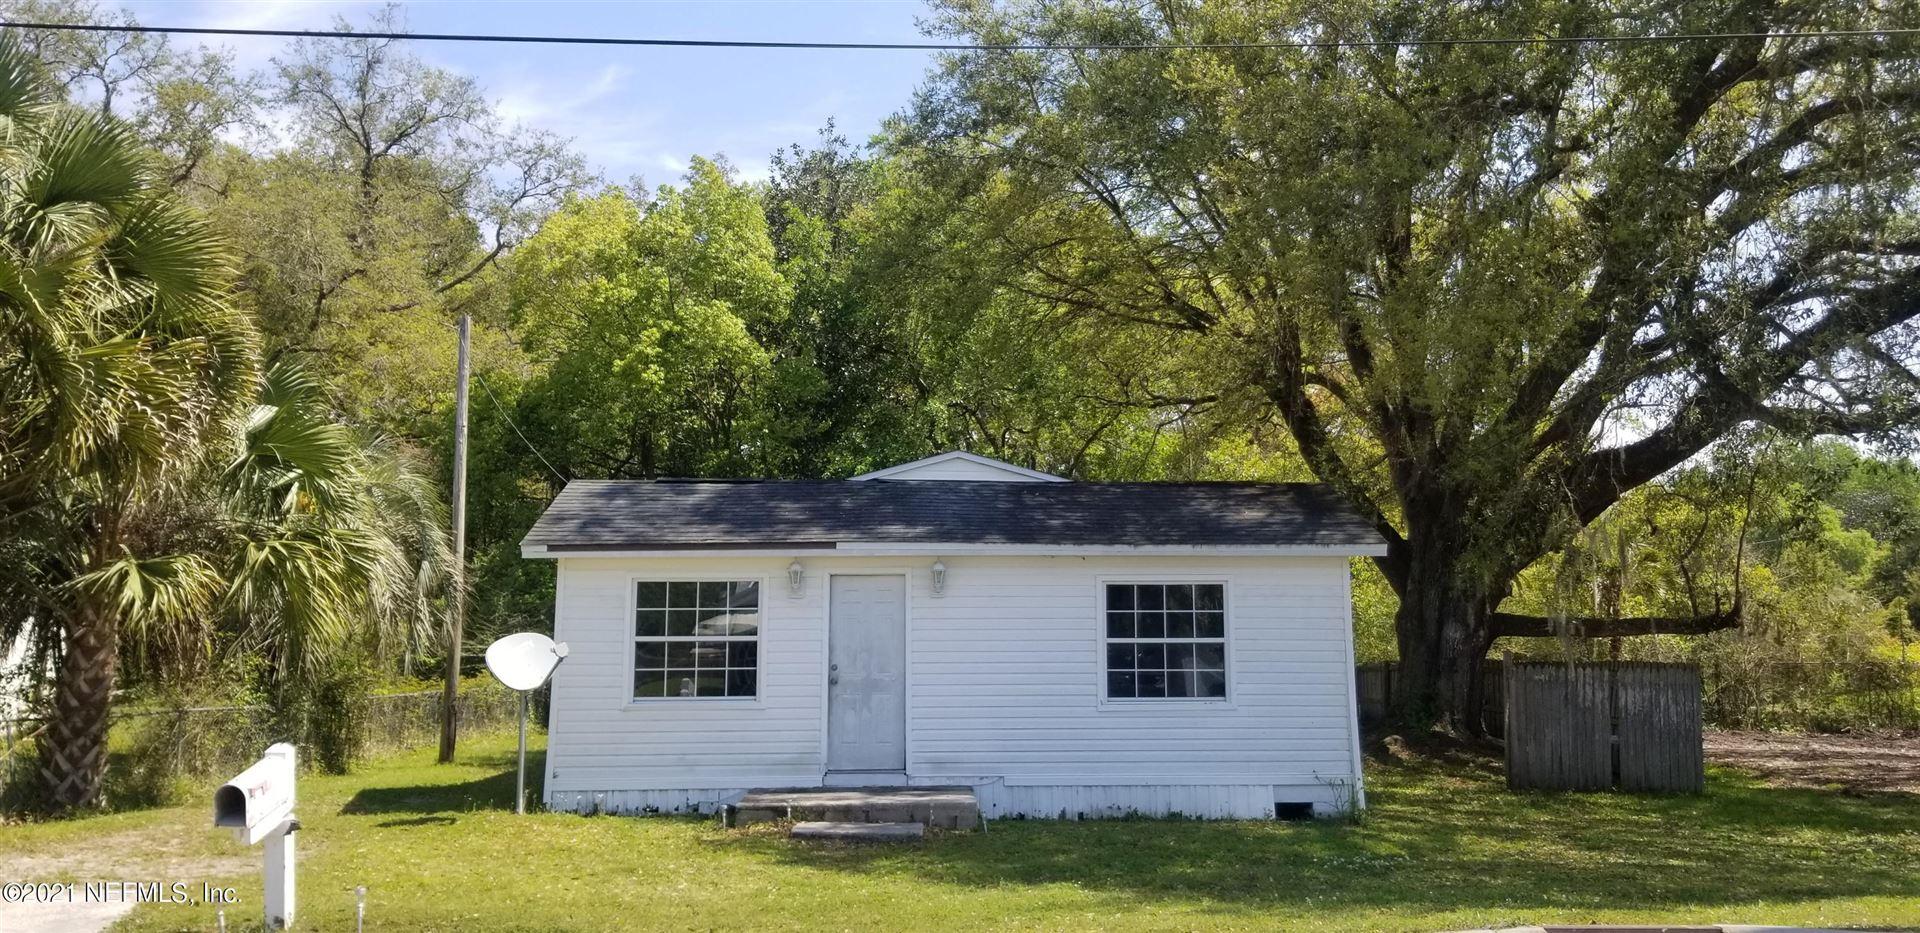 311 RUBY AVE, Green Cove Springs, FL 32043 - MLS#: 1101129